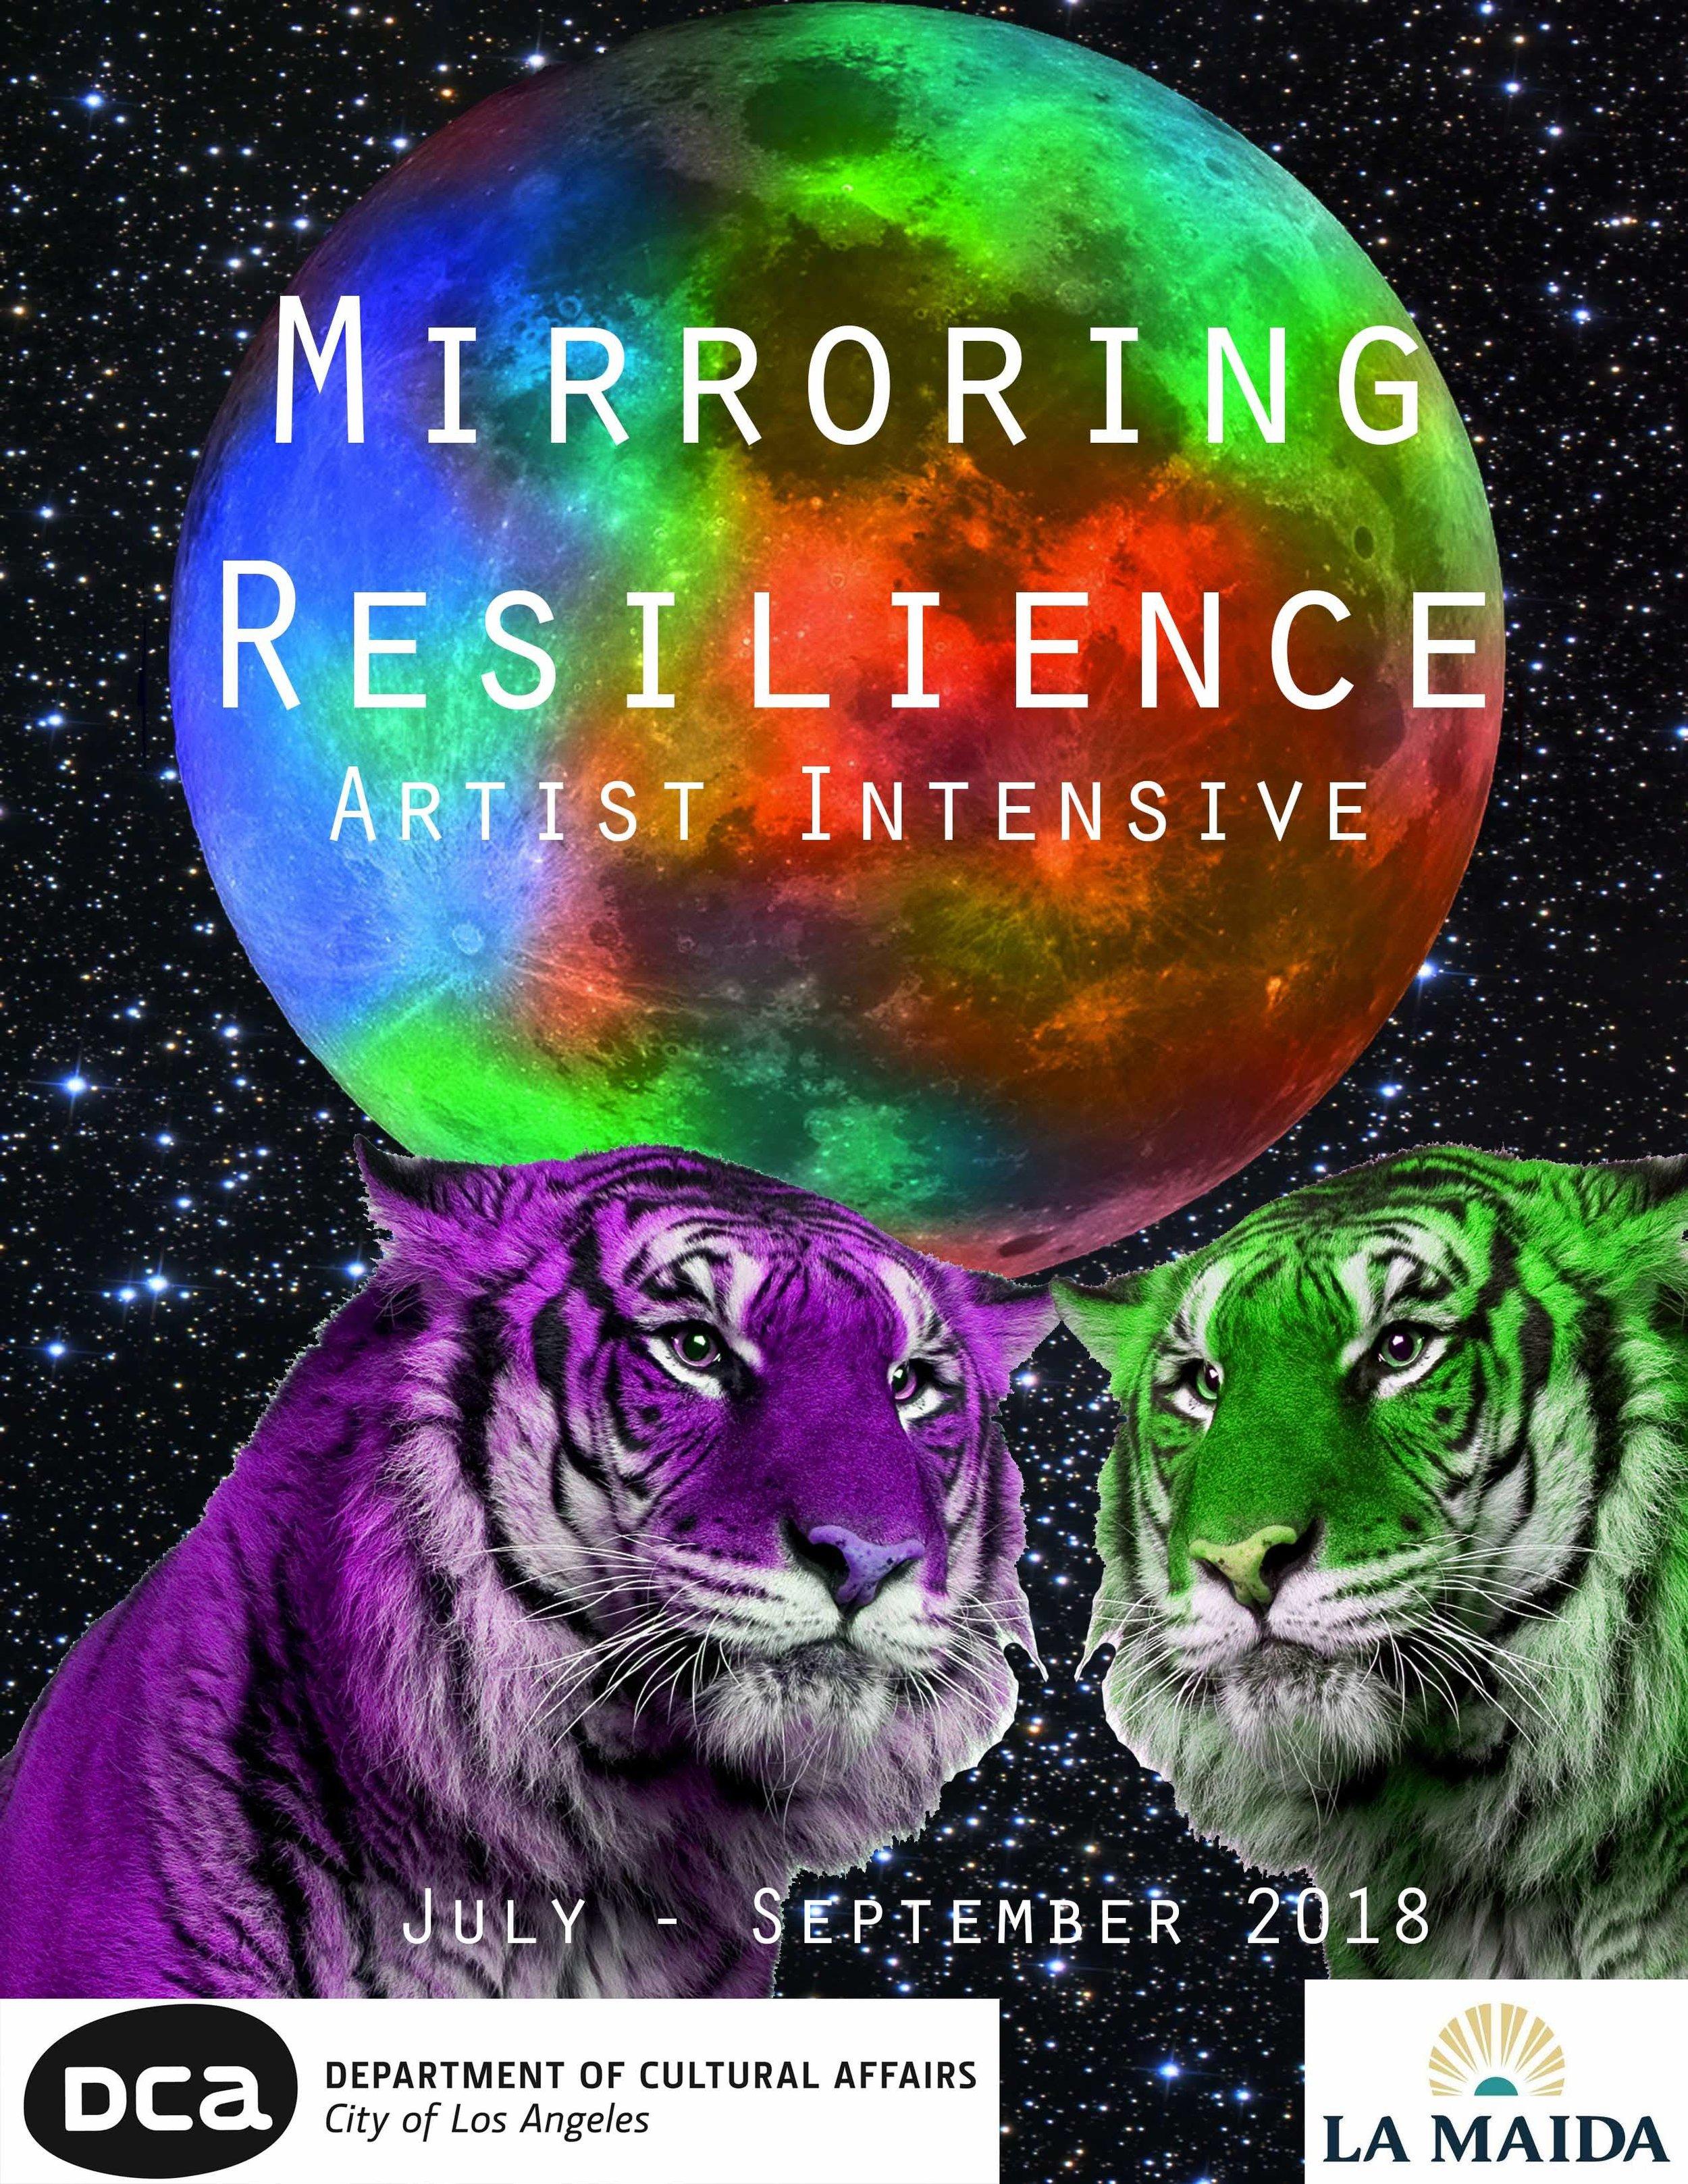 mirroringresilience.jpg